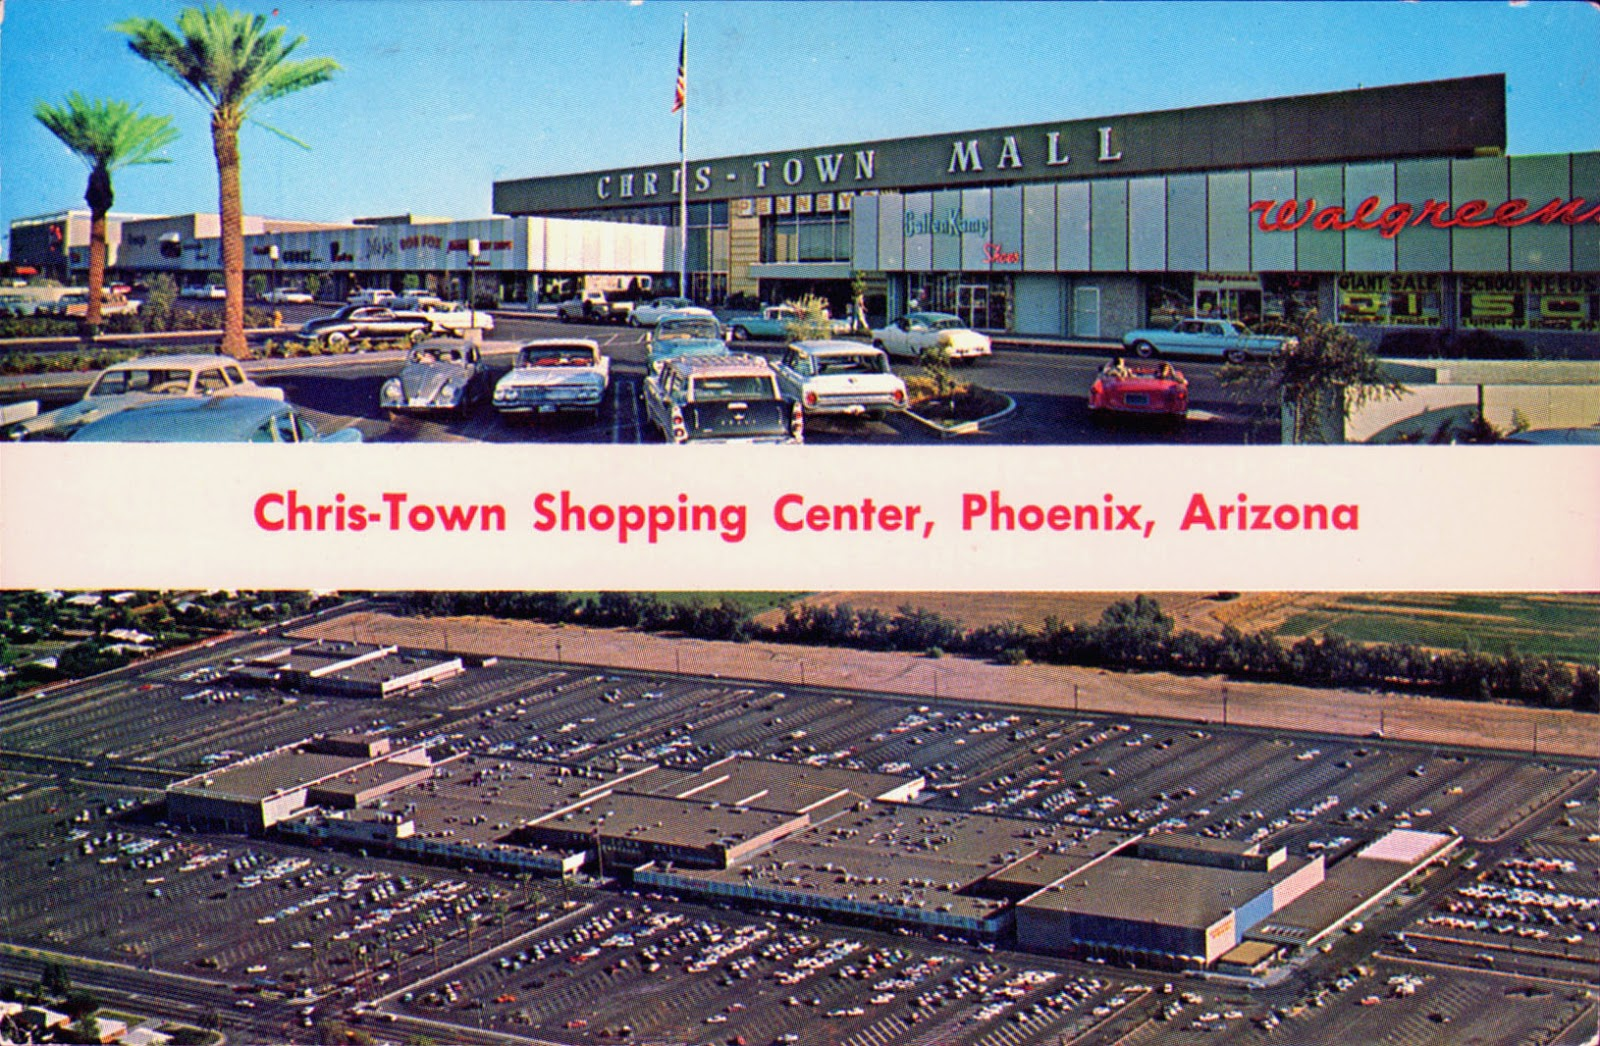 chris-town shopp...K 85086